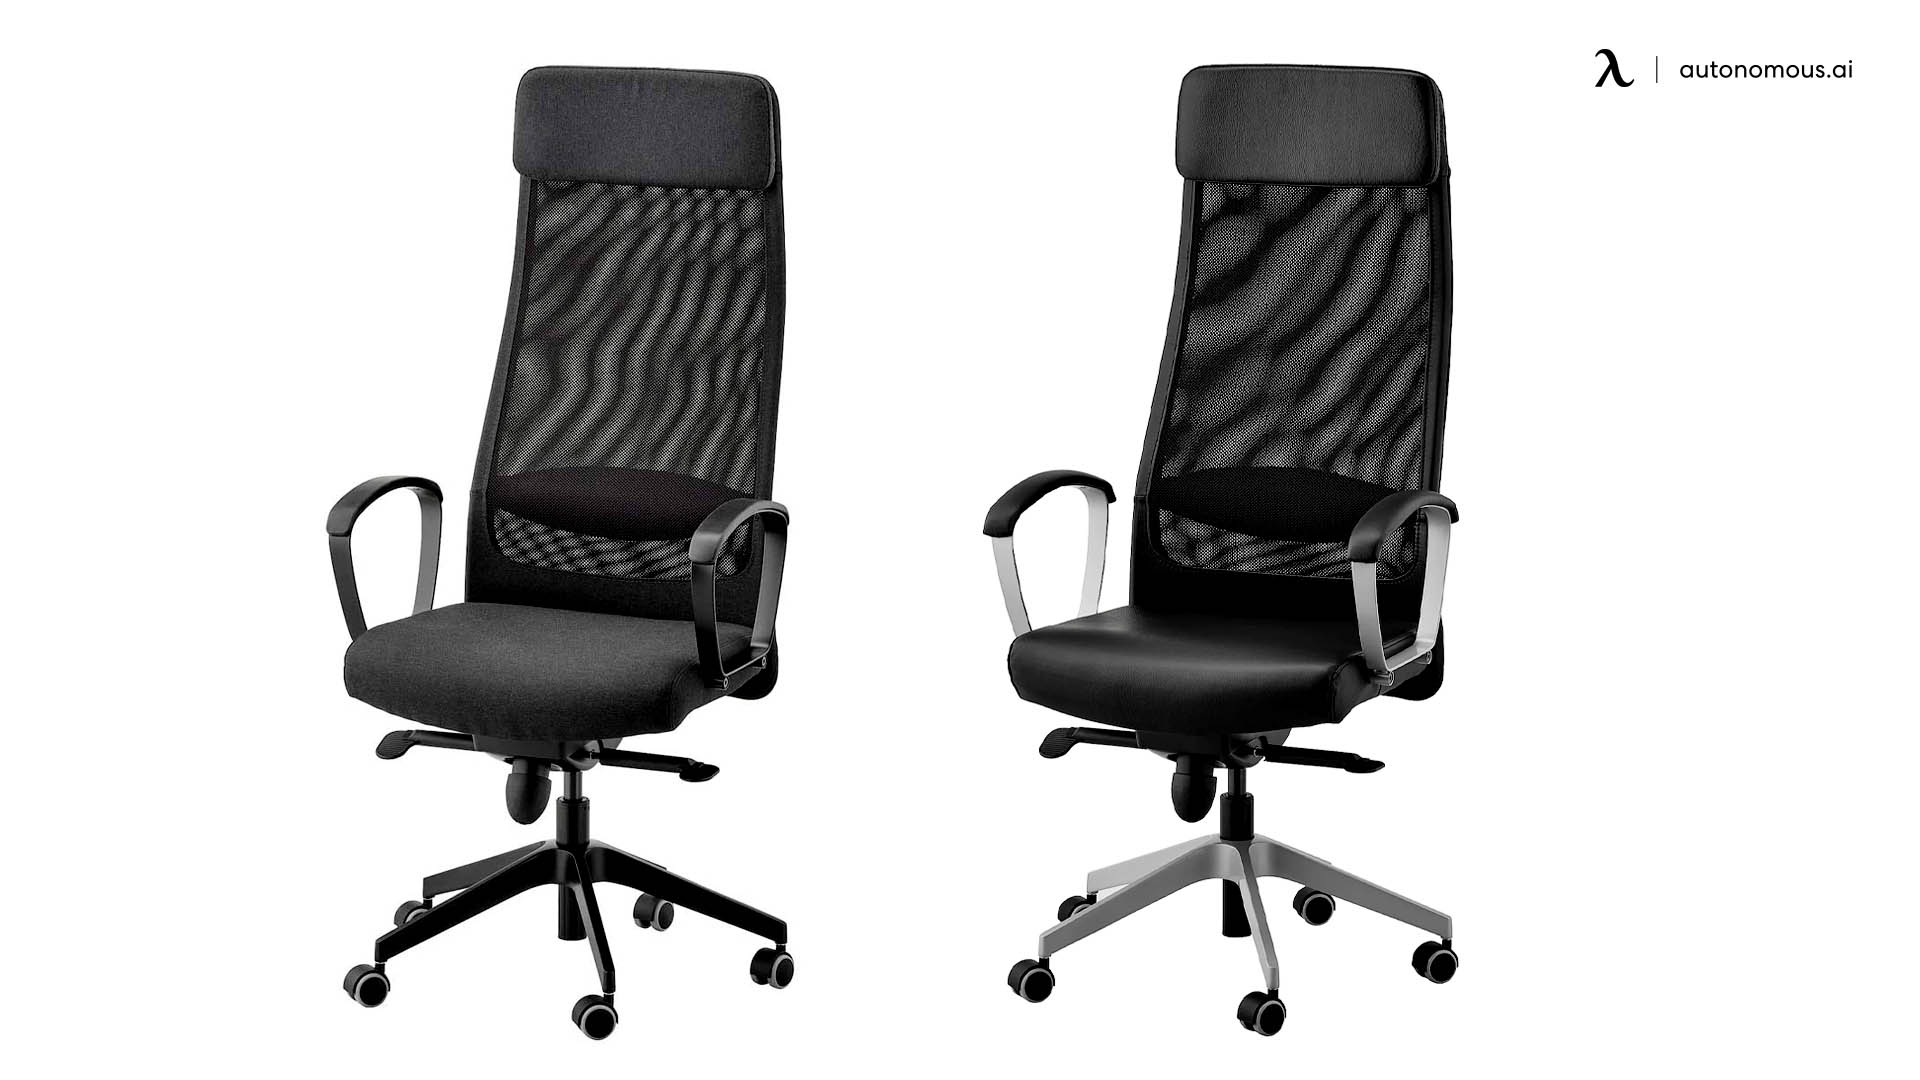 Ikea Markus High Back Ergonomic Office Chair